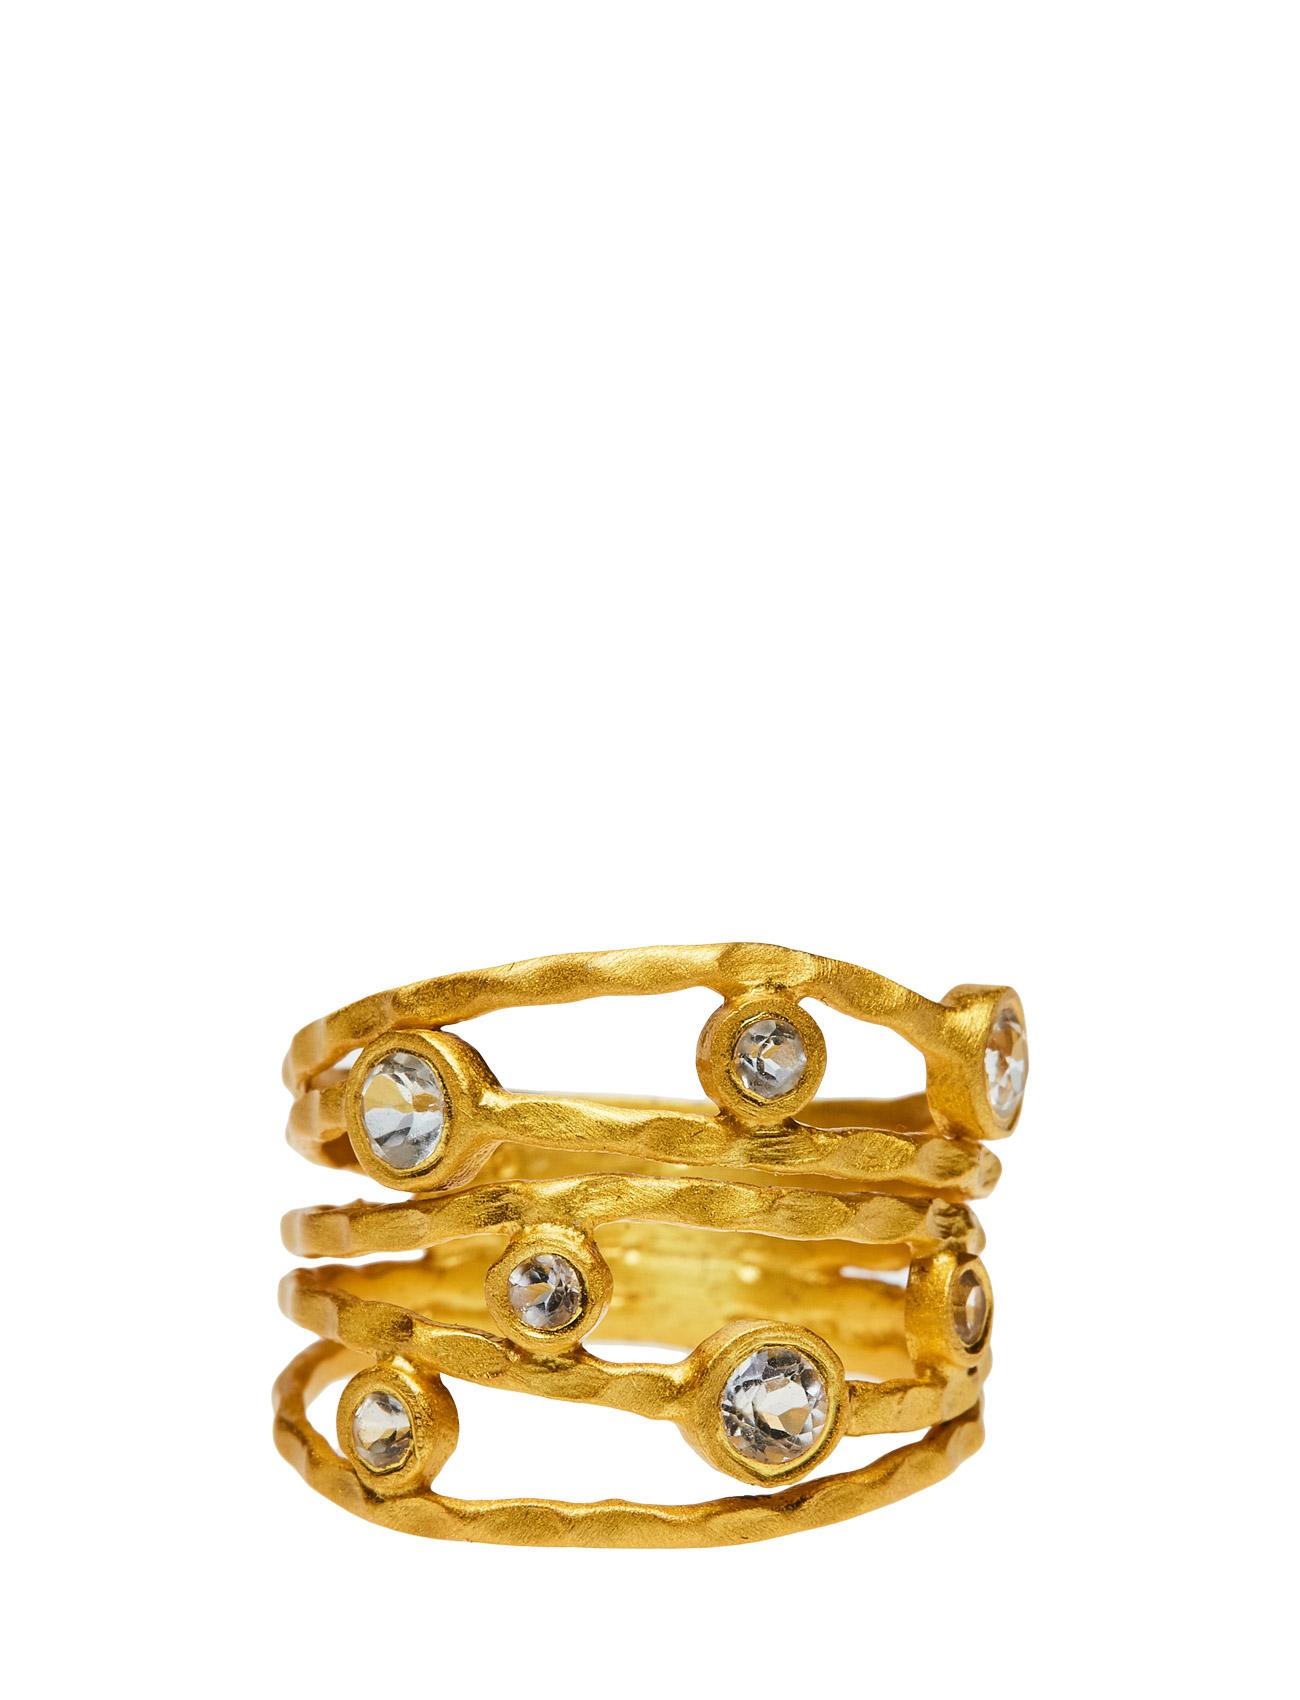 Ring Twisted Gem - Jewlscph